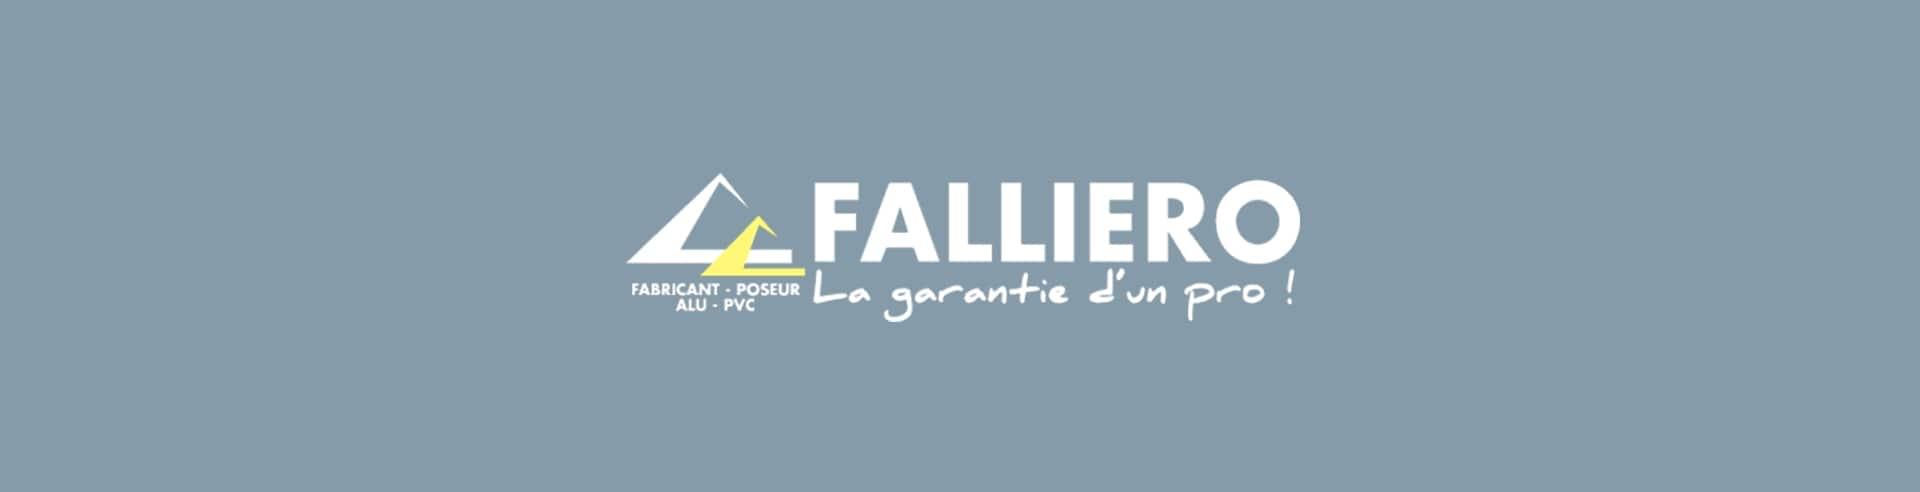 Magasin Falliero à Tarbes